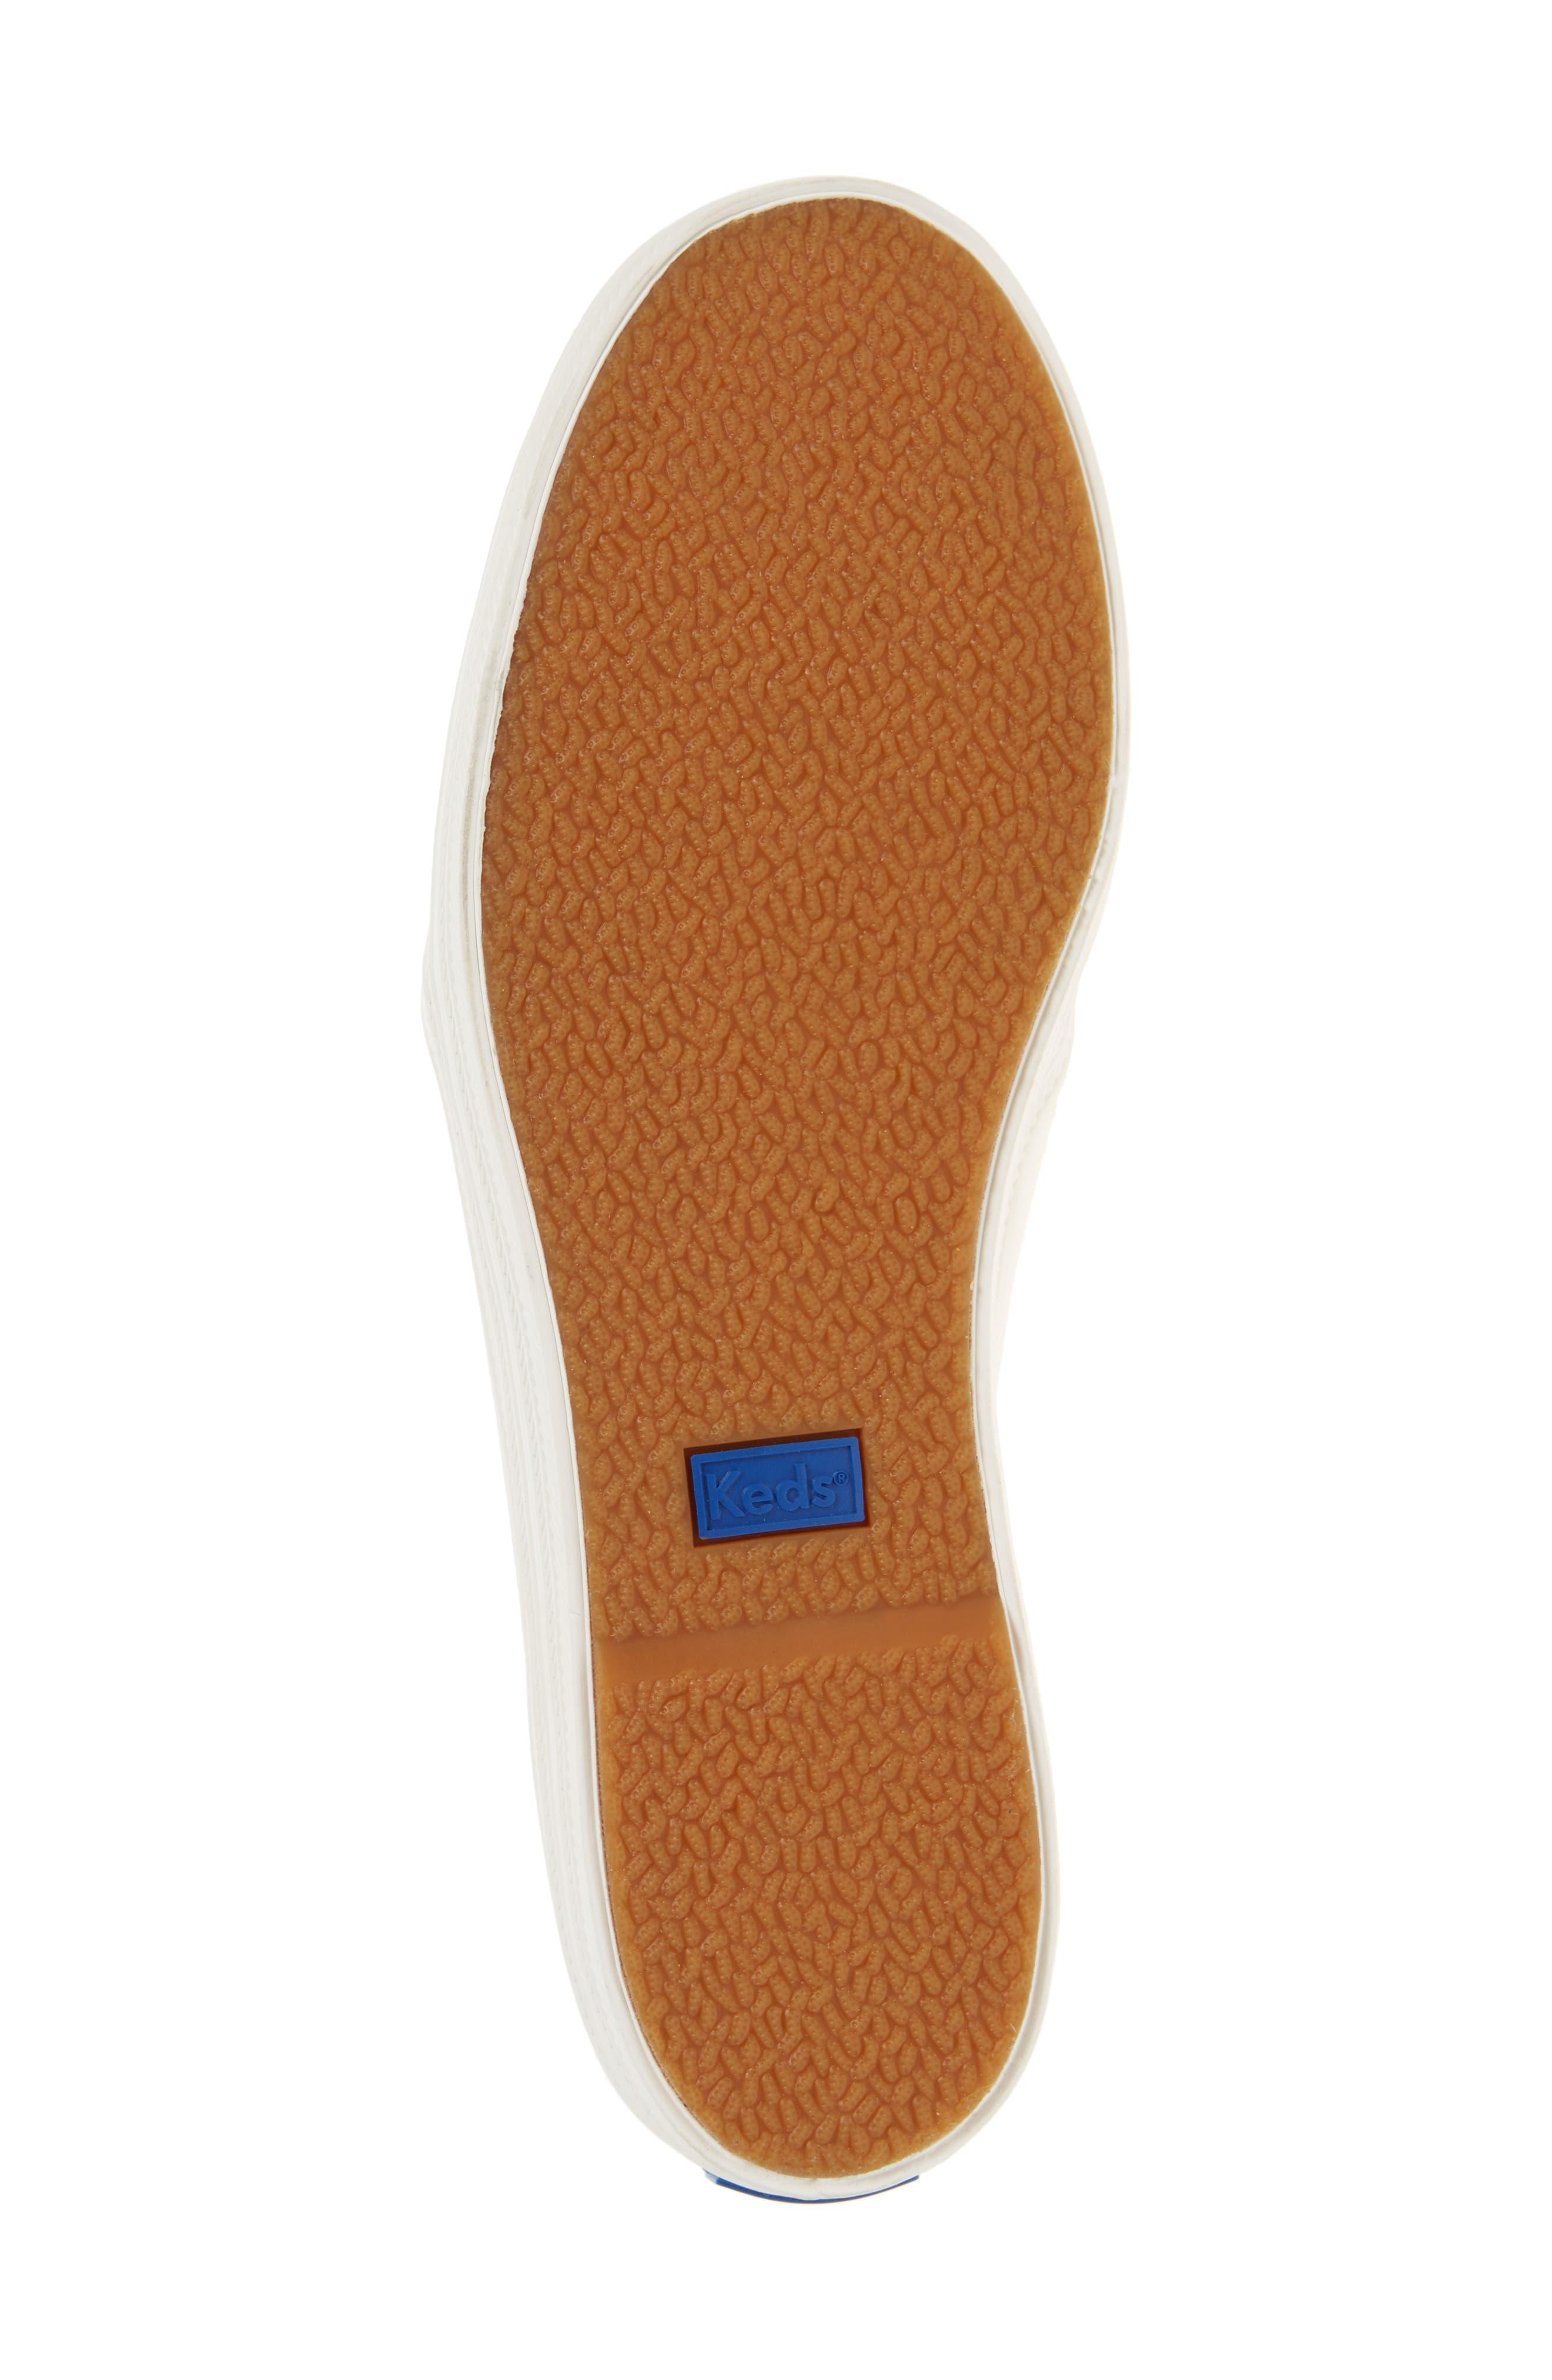 KEDS<SUP>®</SUP> FOR KATE SPADE NEW YORK, triple decker embellished slip-on sneaker, Alternate thumbnail 6, color, CREAM